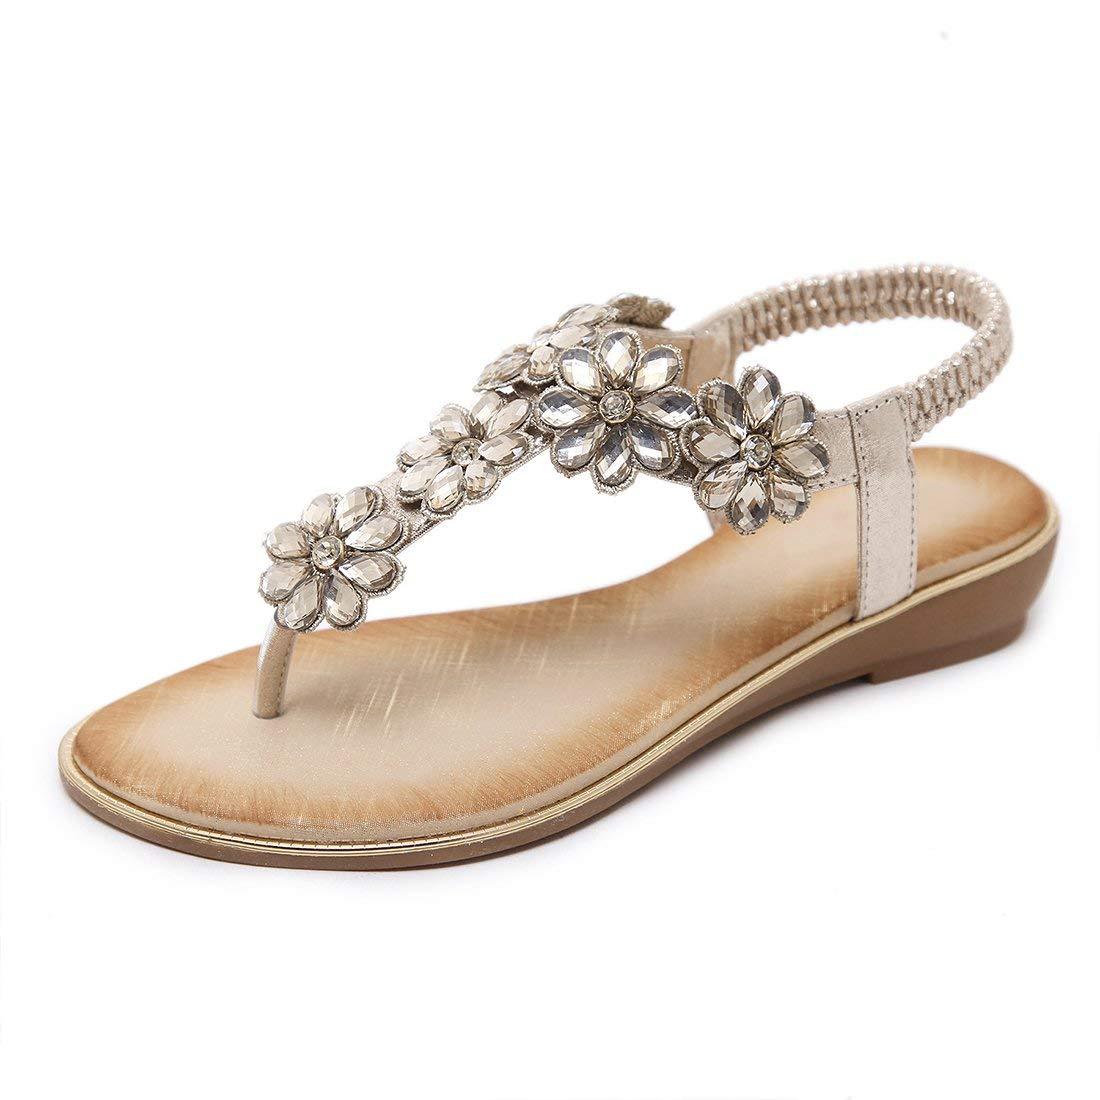 58f64db7ccc Get Quotations · Women s Rhinestone Flat Sandals Flip Flops T-Strap Wedding  Thong Sandals